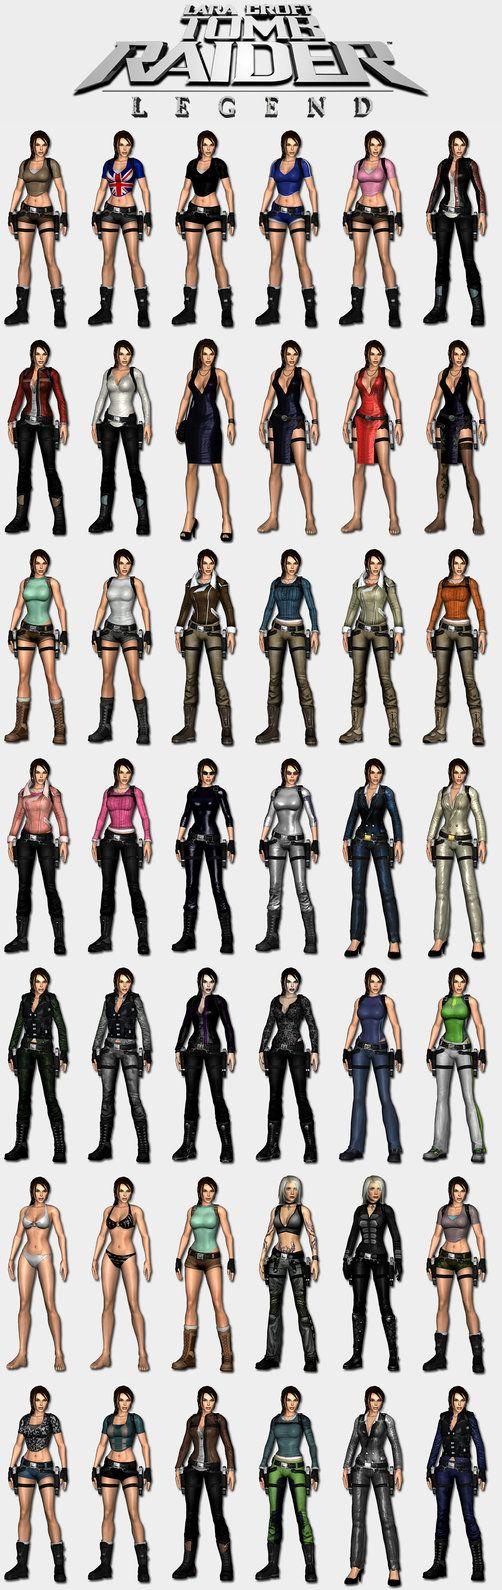 Tomb Raider Legend - Lara's outfits by HailSatana on DeviantArt